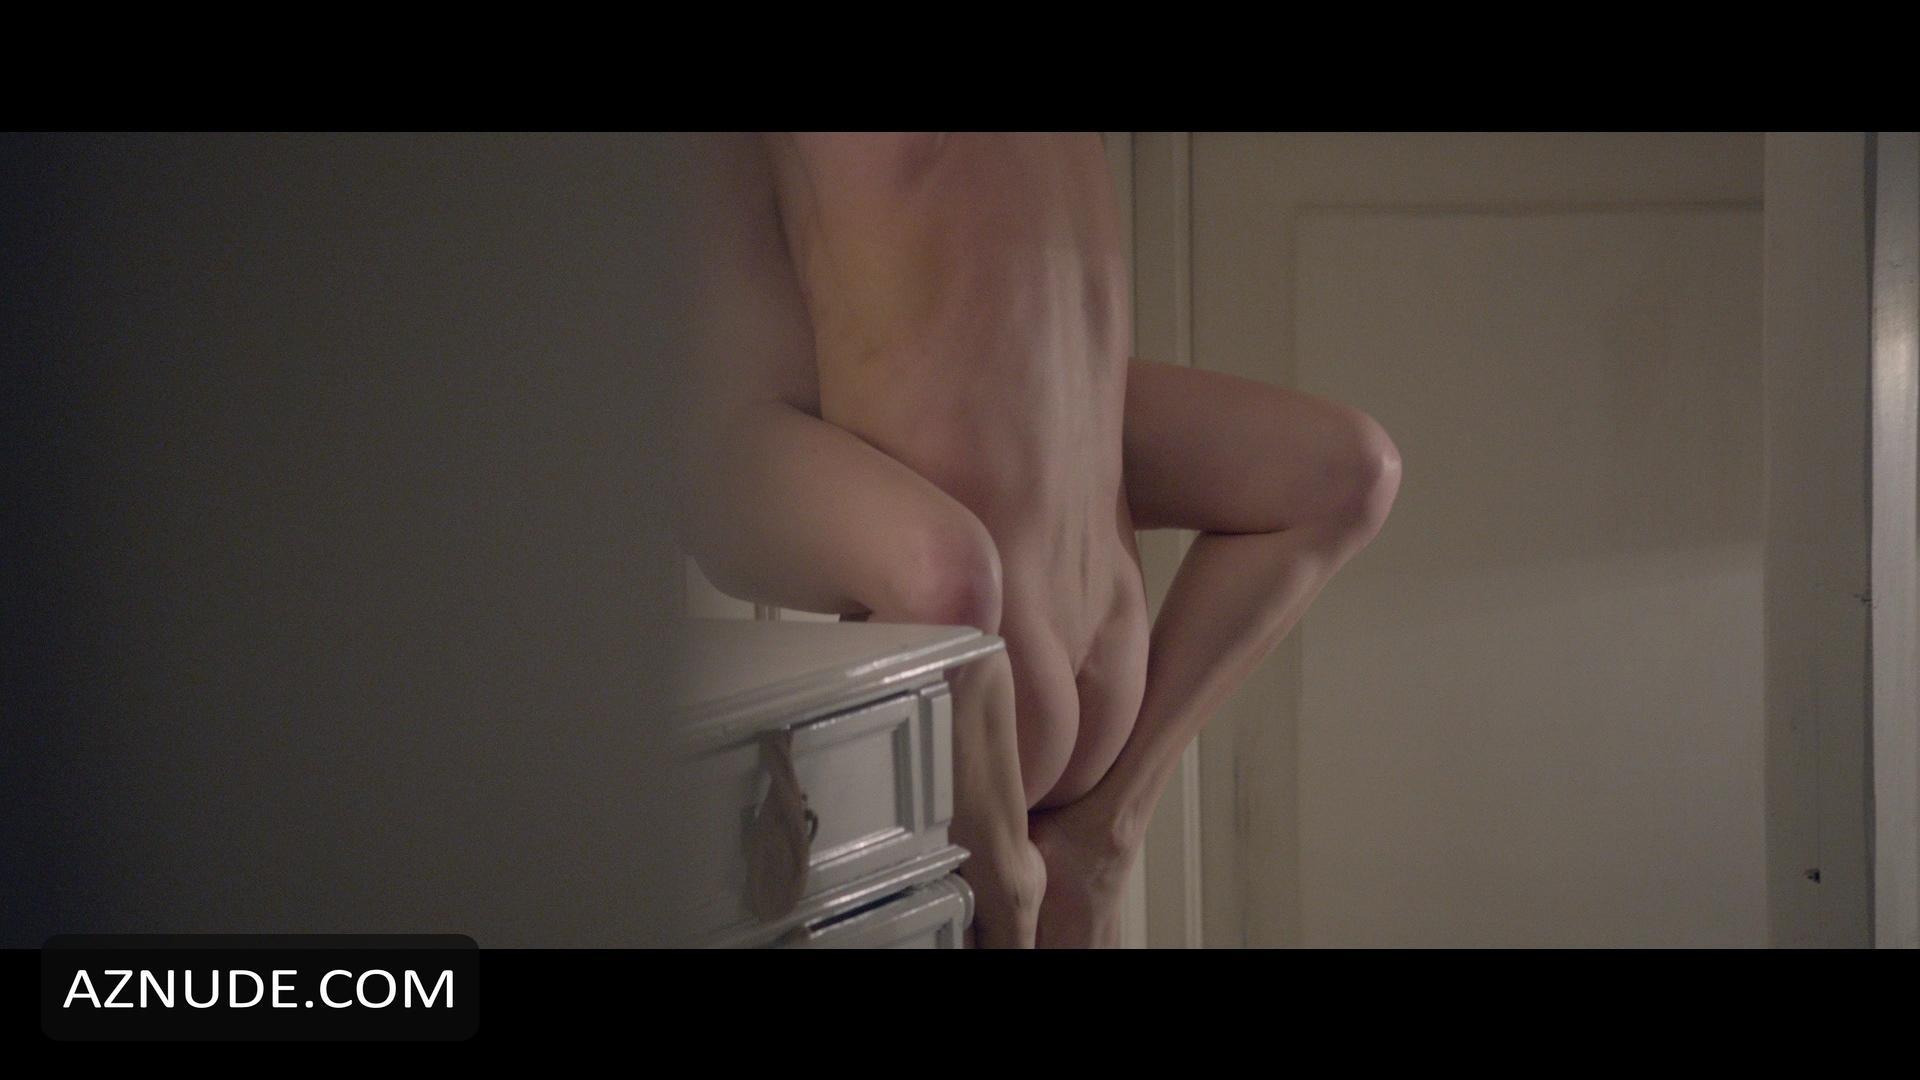 shia-labeouf-nymphomaniac-sex-scene-naked-pics-of-tamara-taylor